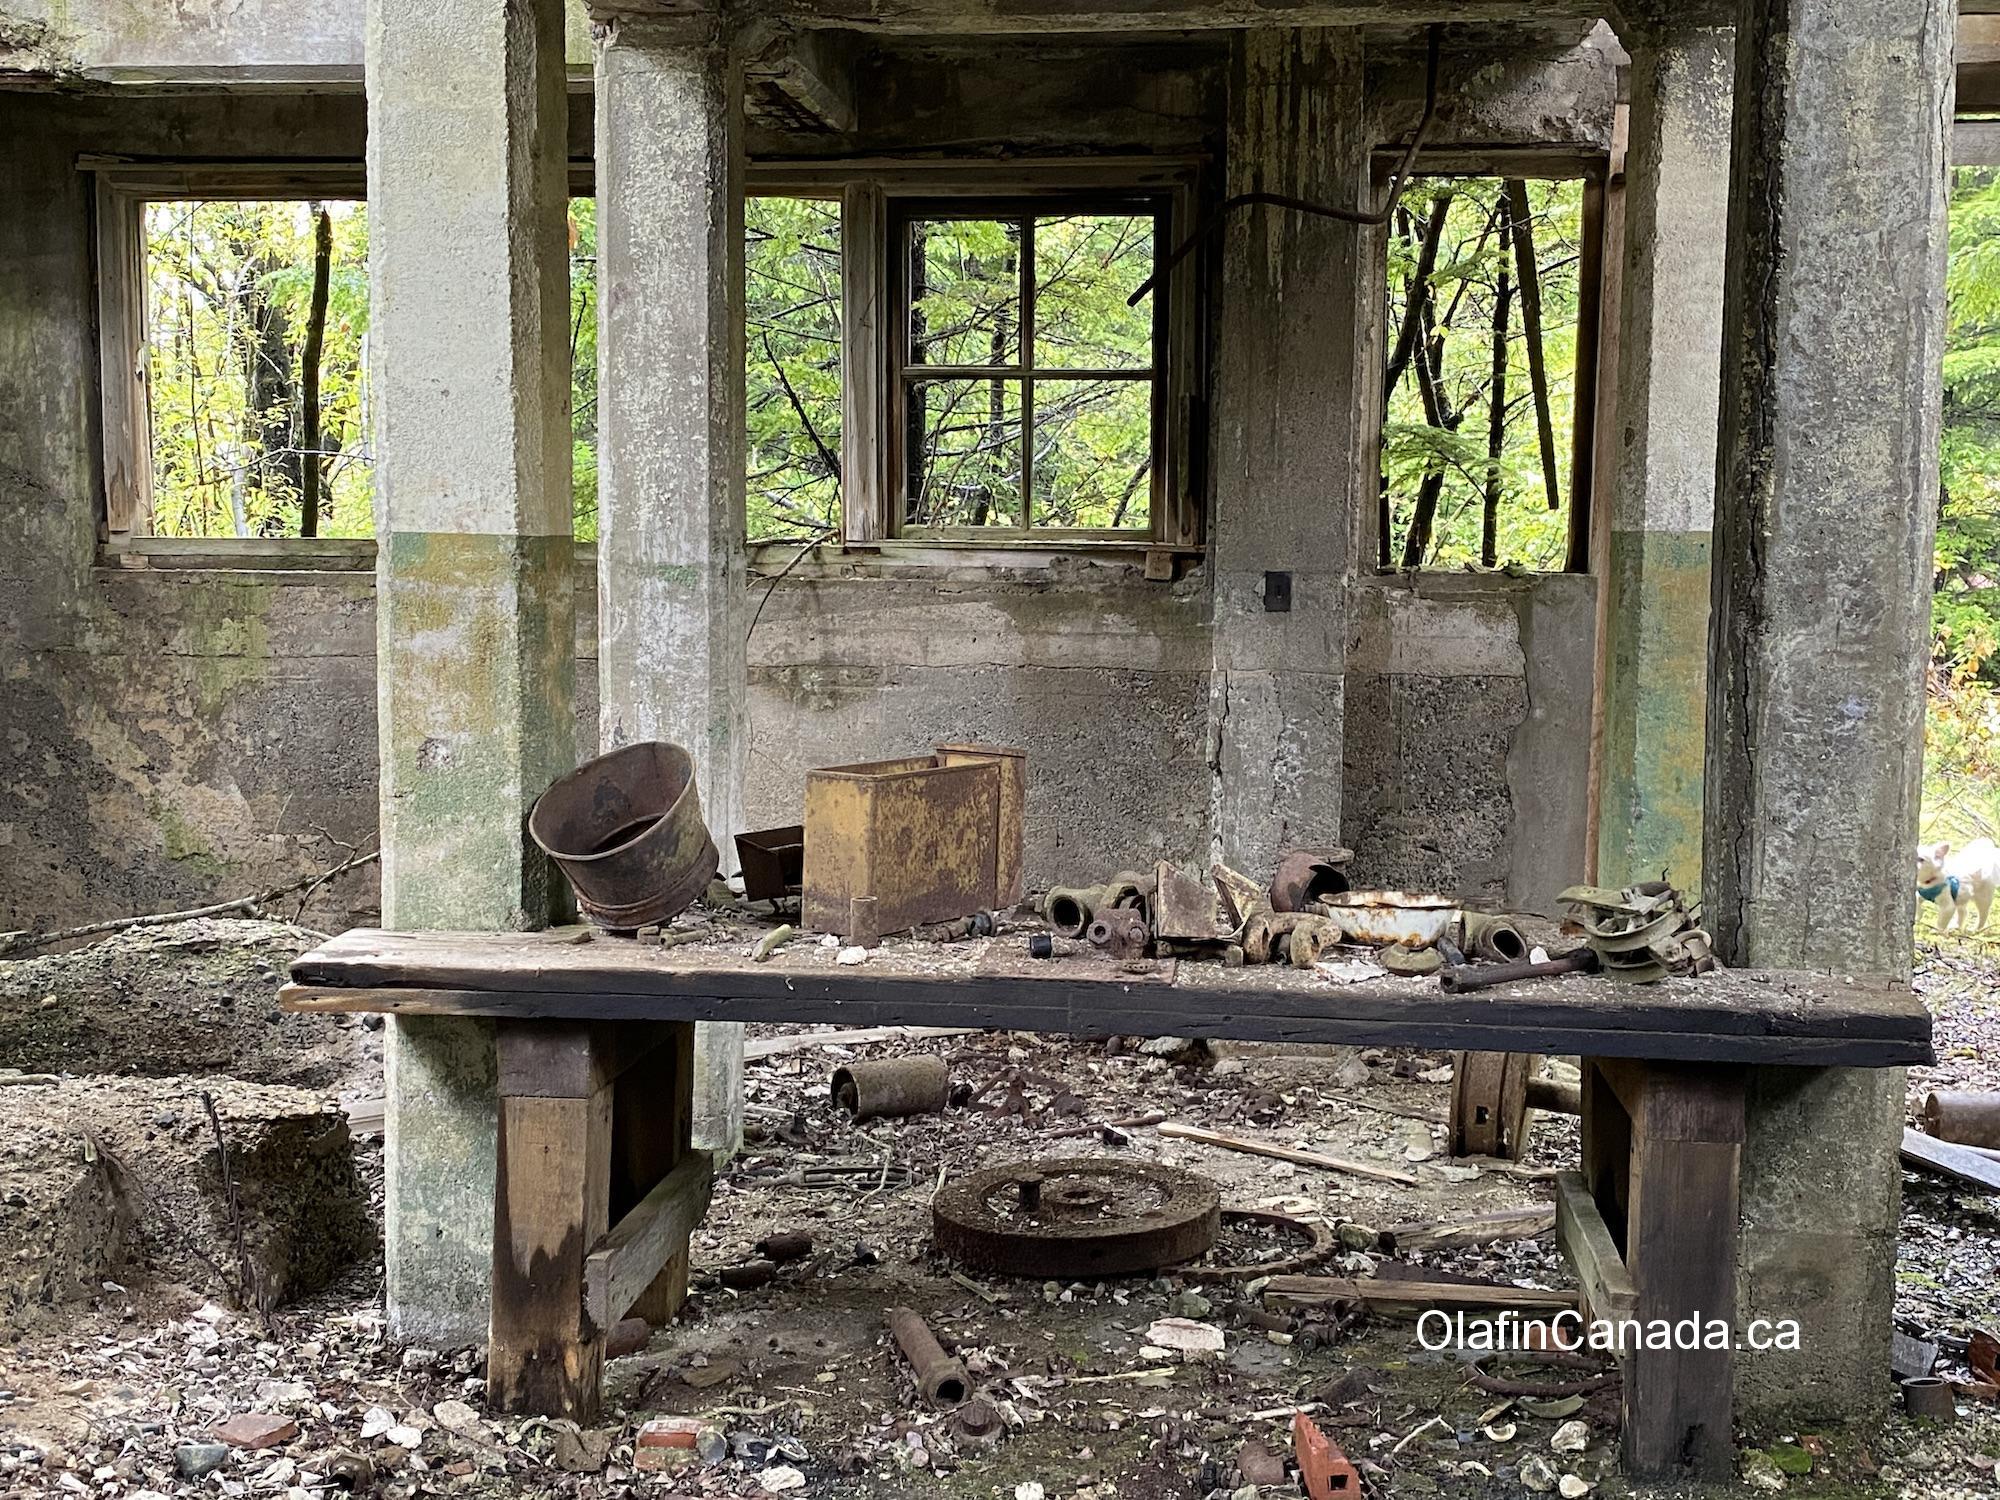 Deserted crafting table in factory at Anyox #olafincanada #britishcolumbia #discoverbc #abandonedbc #anyox